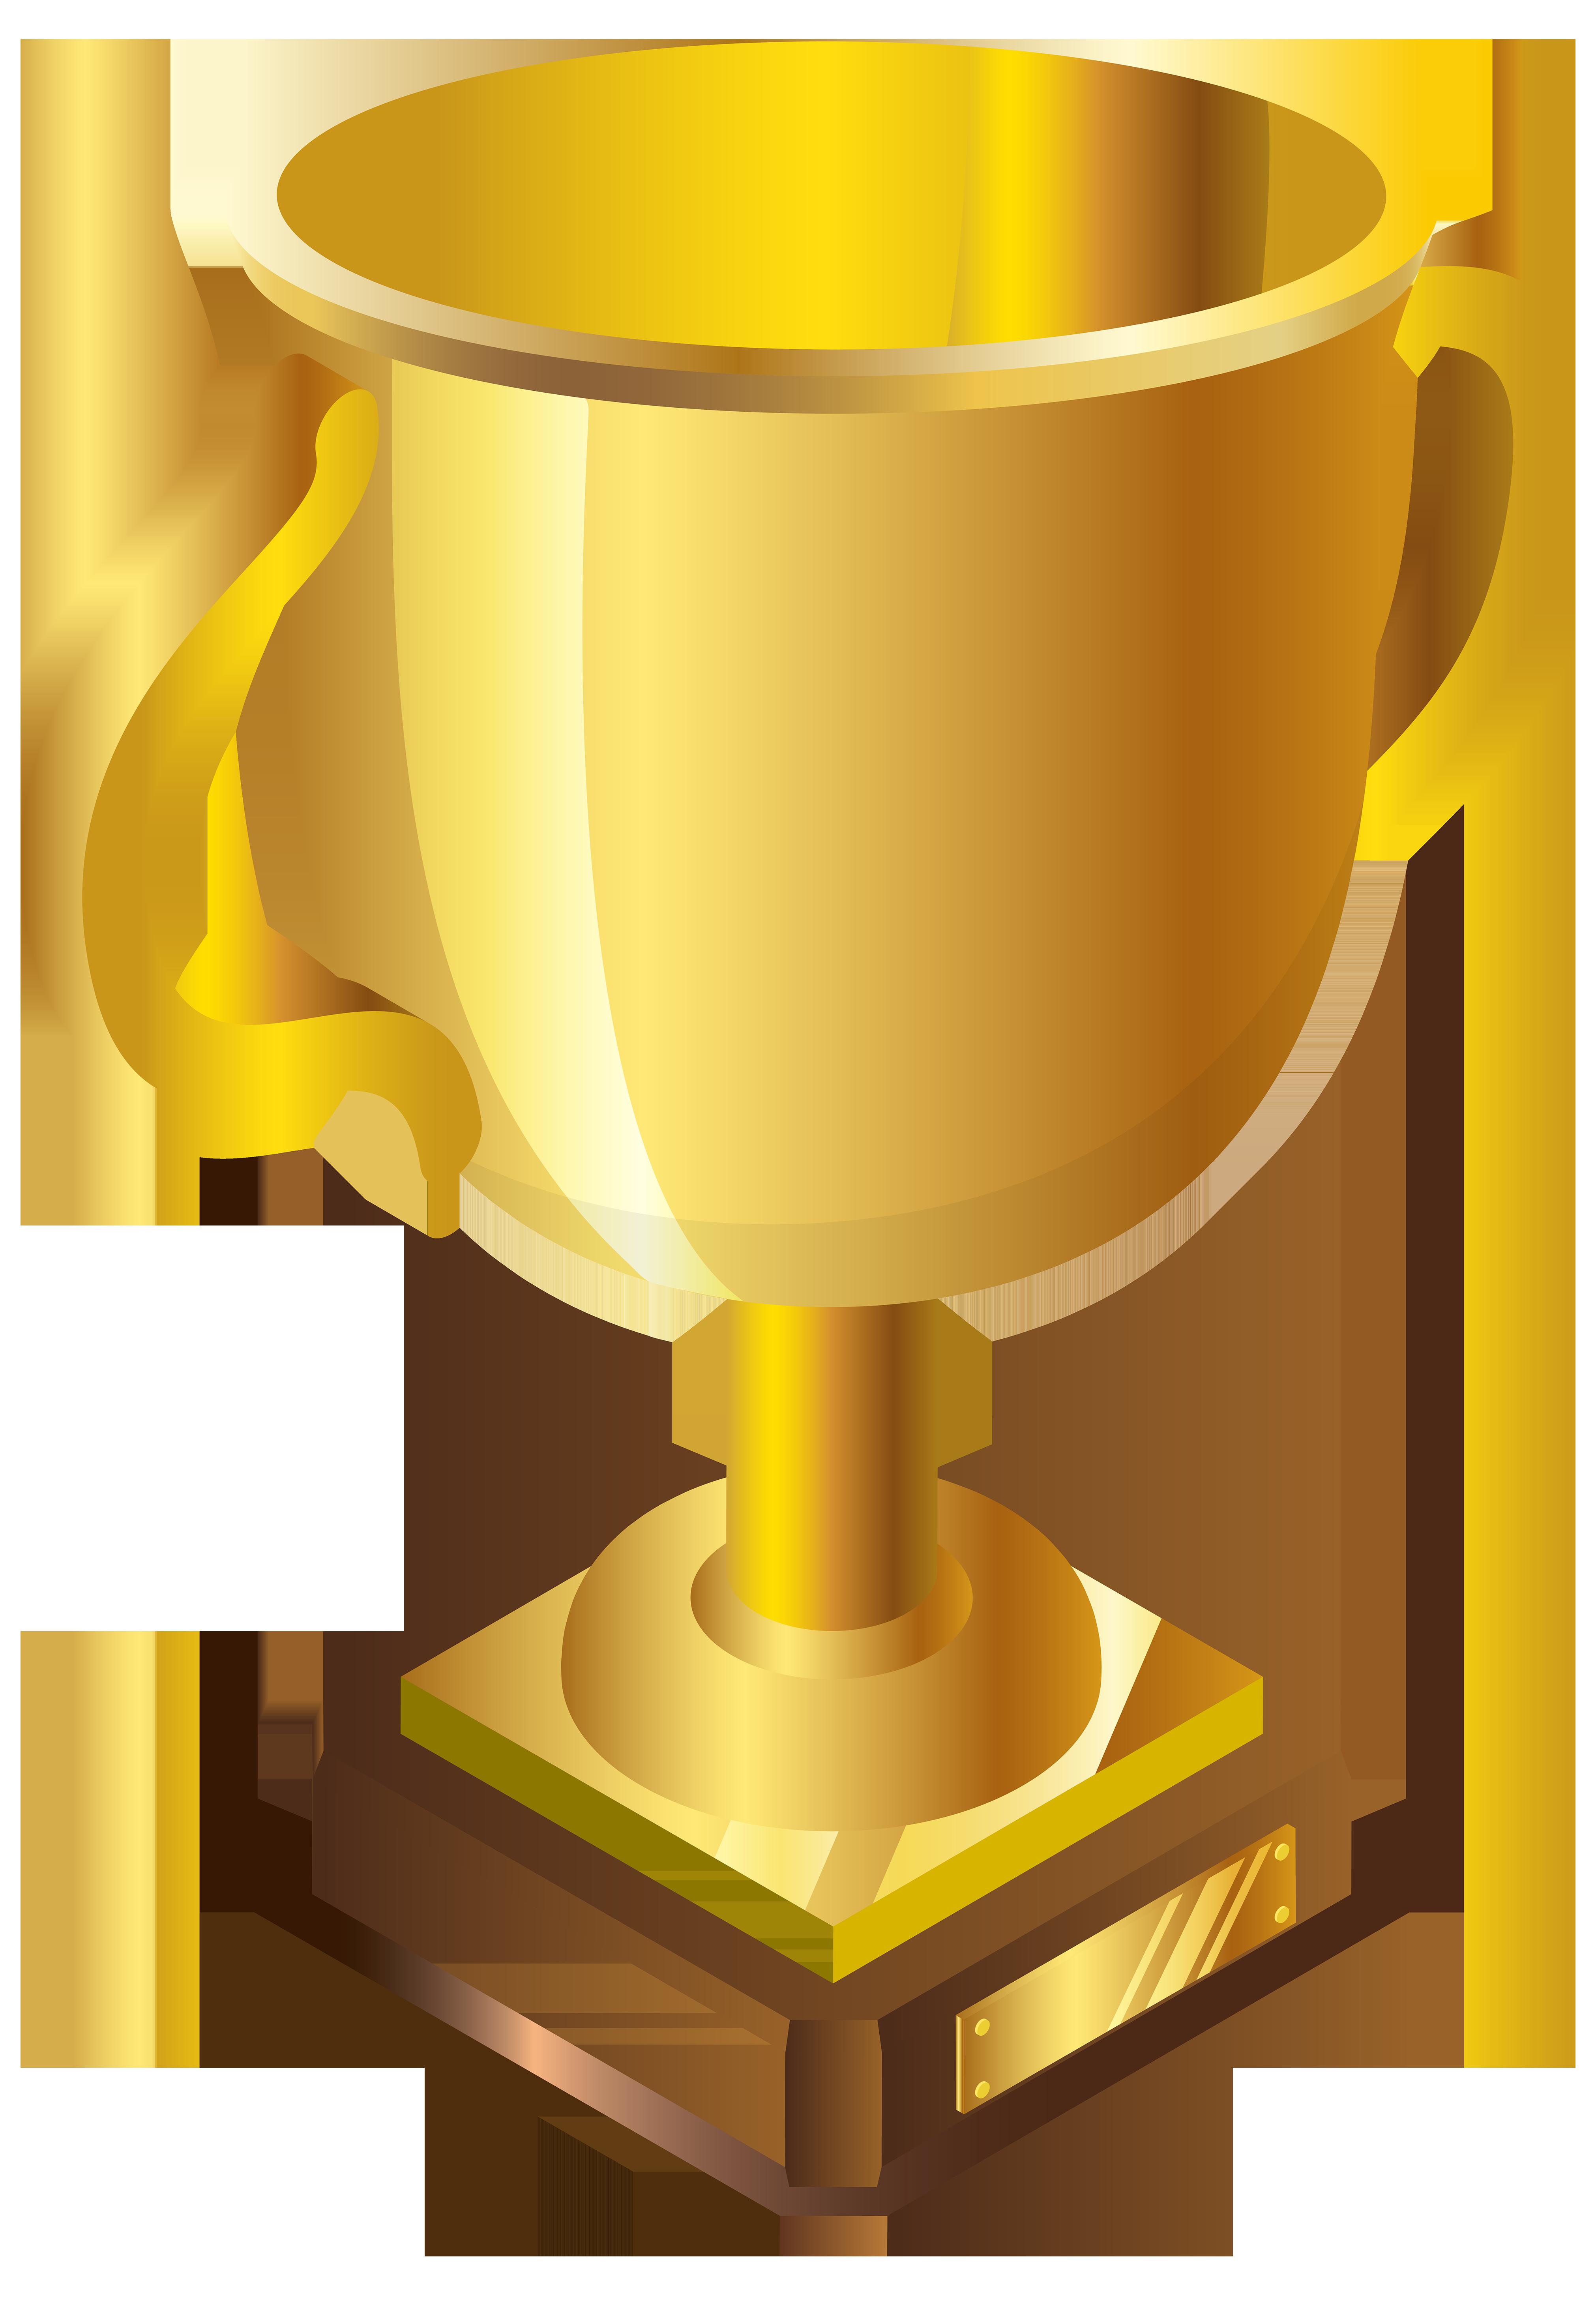 Golden Cup Transparent Images